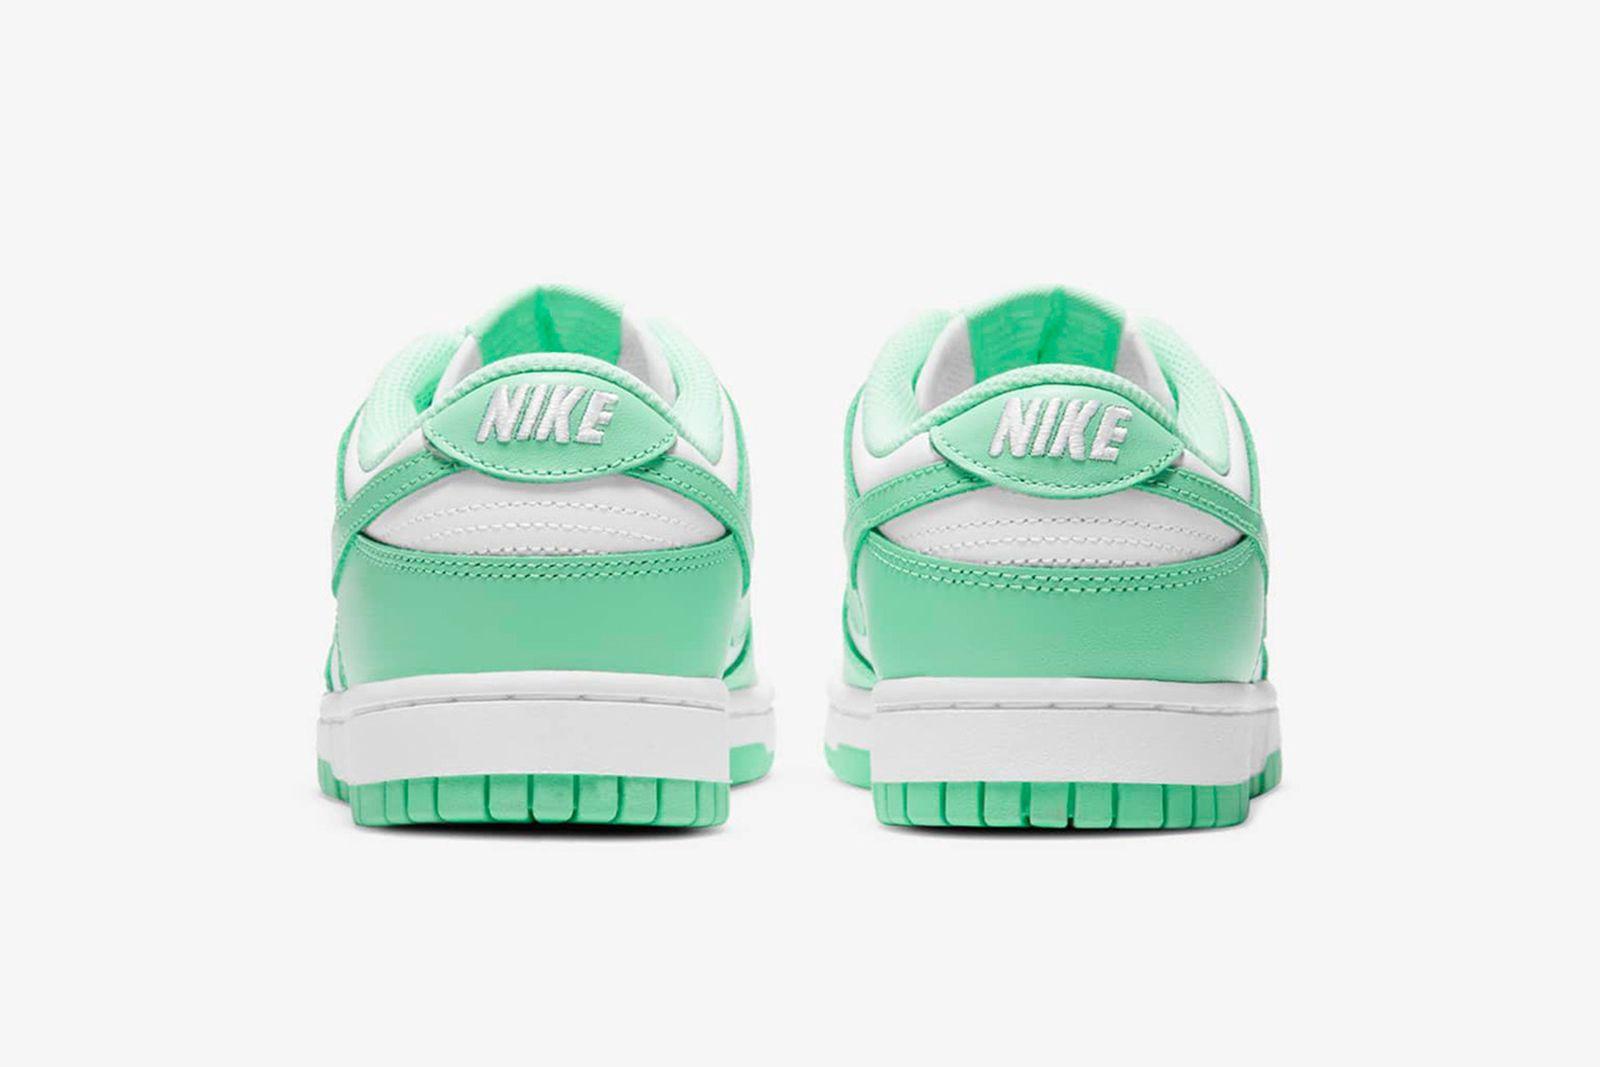 nike-dunk-low-green-glow-release-date-price-04